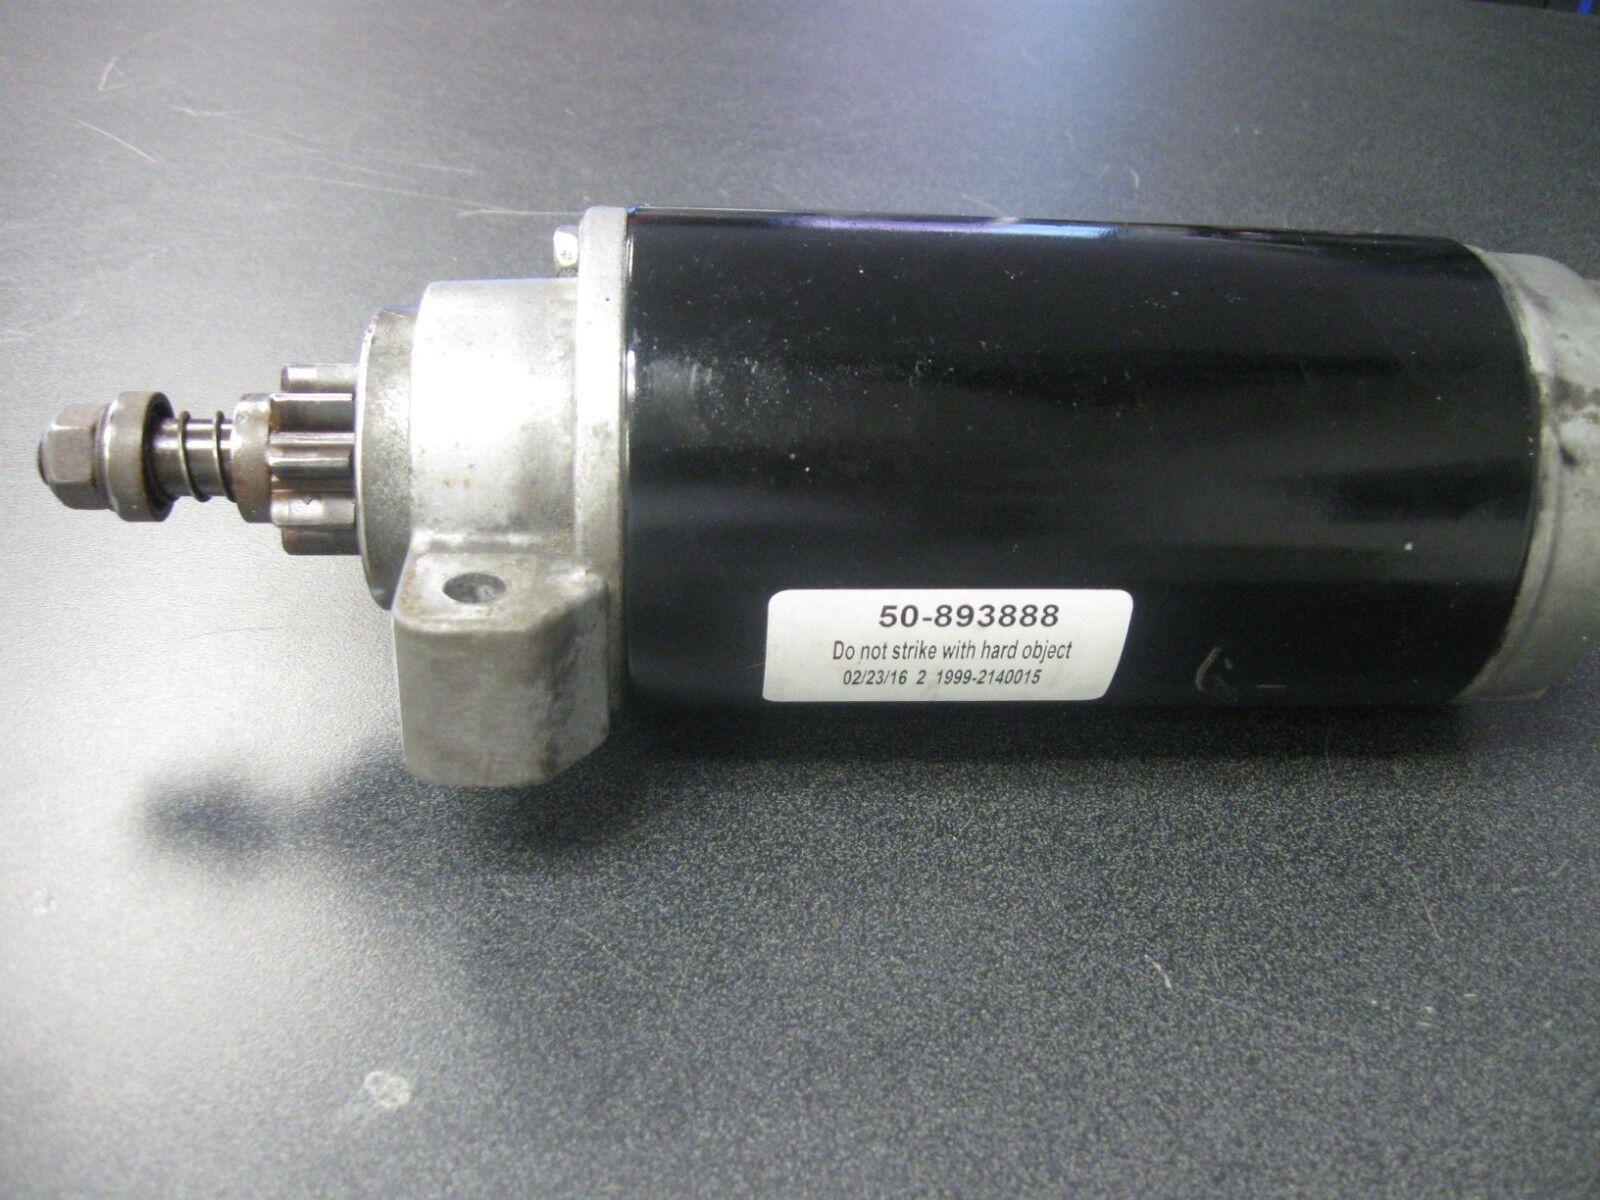 Mercury Außenborder Anlasser Assy Assy Assy 893888T 18c0d4